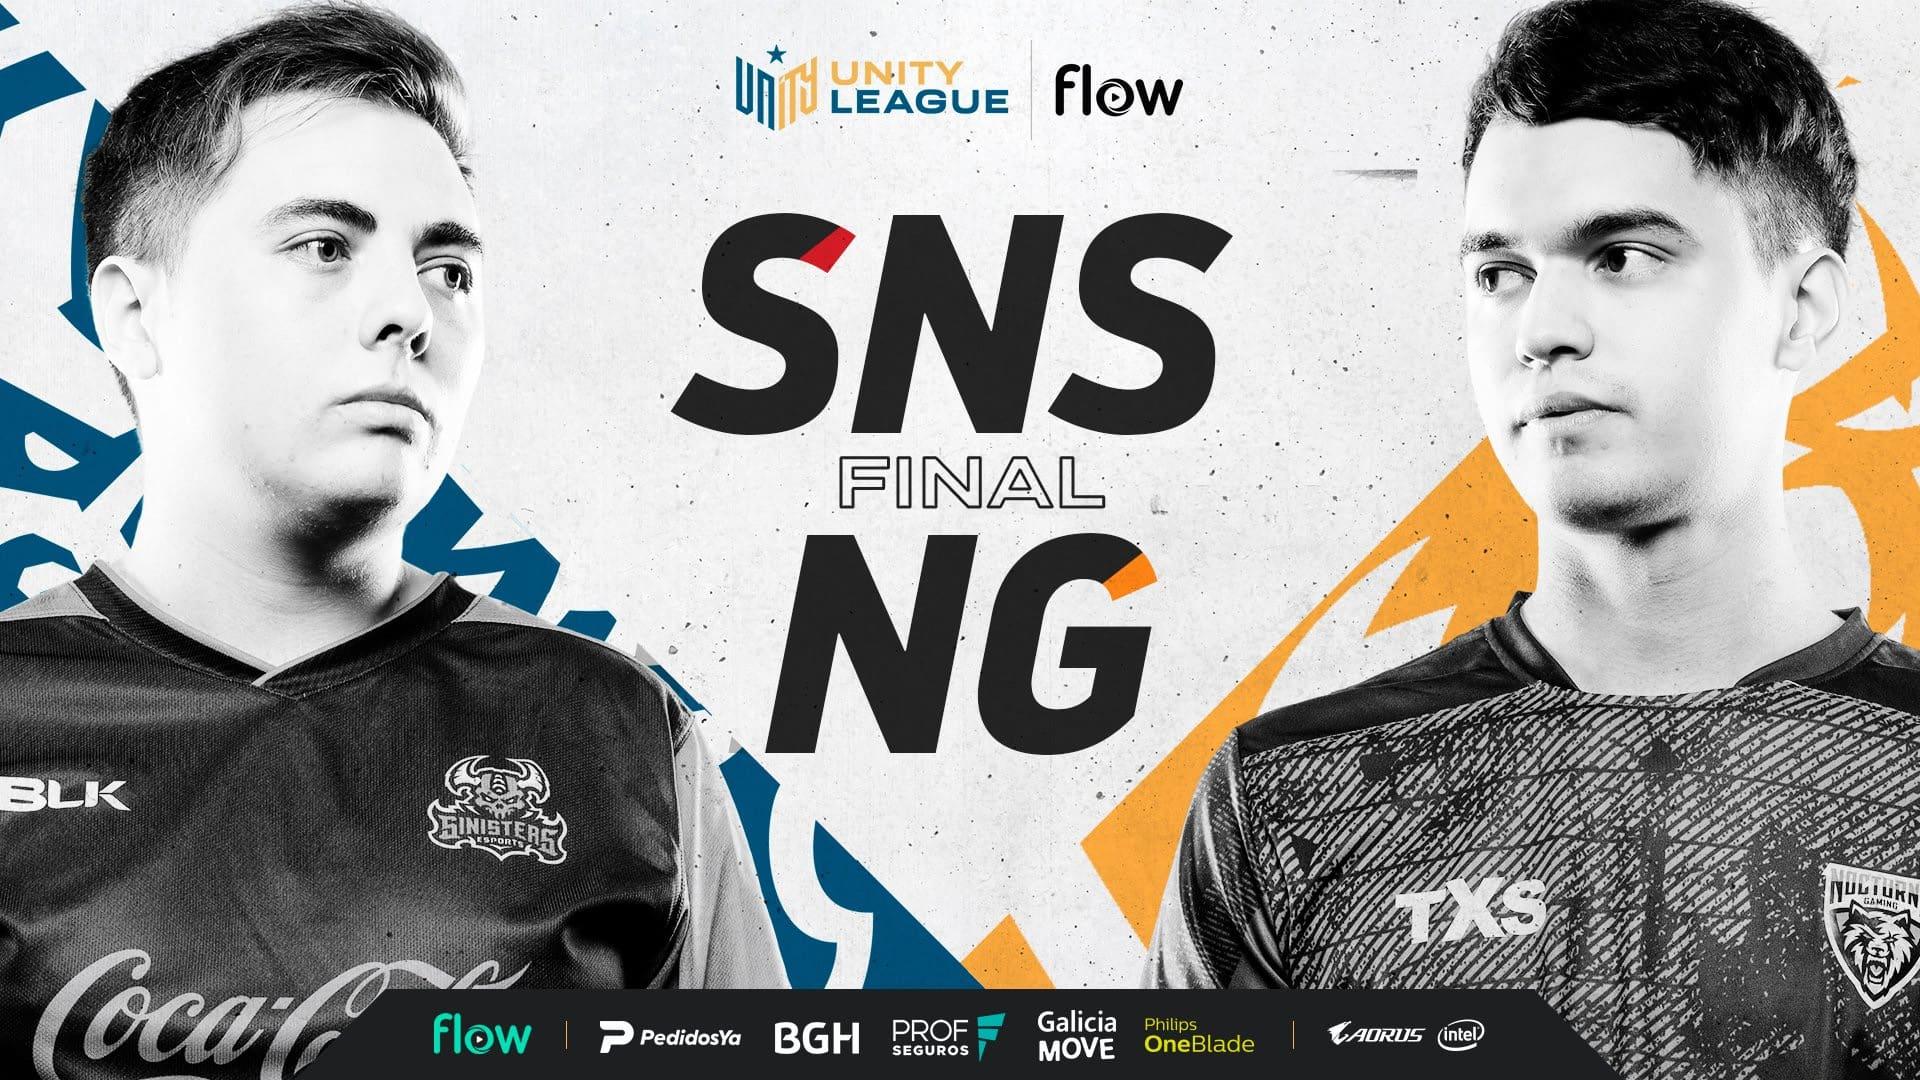 Sinisters y Nocturns Gaming se enfrentan en la gran final de Unity League Flow de CS:GO